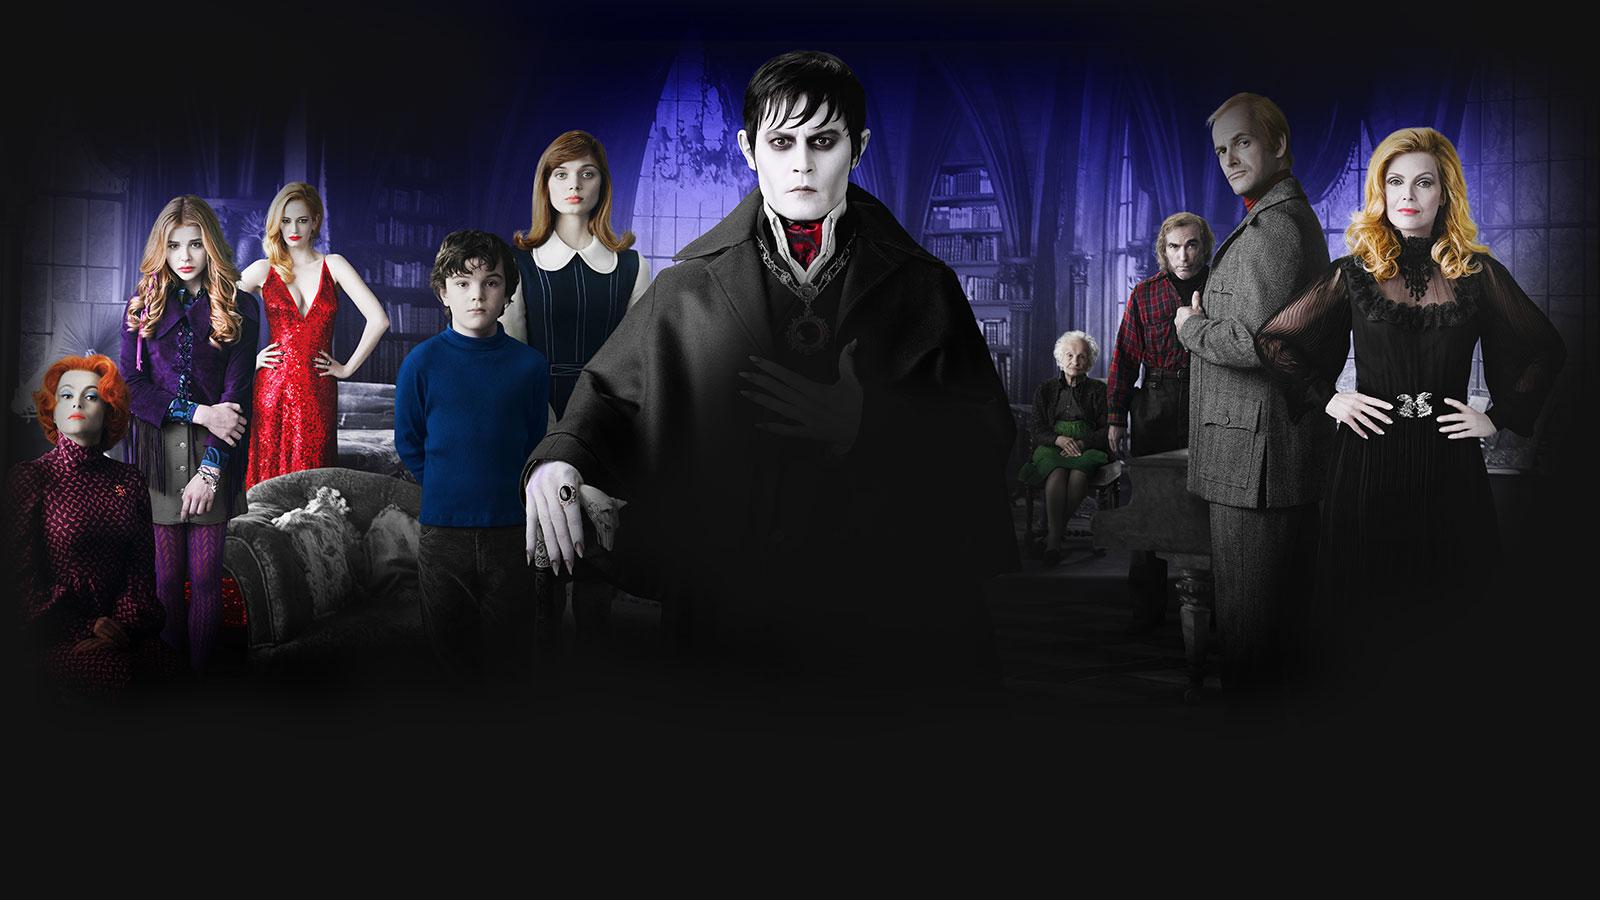 Dark Shadows 2012   Movies Wallpaper 29774222 1600x900